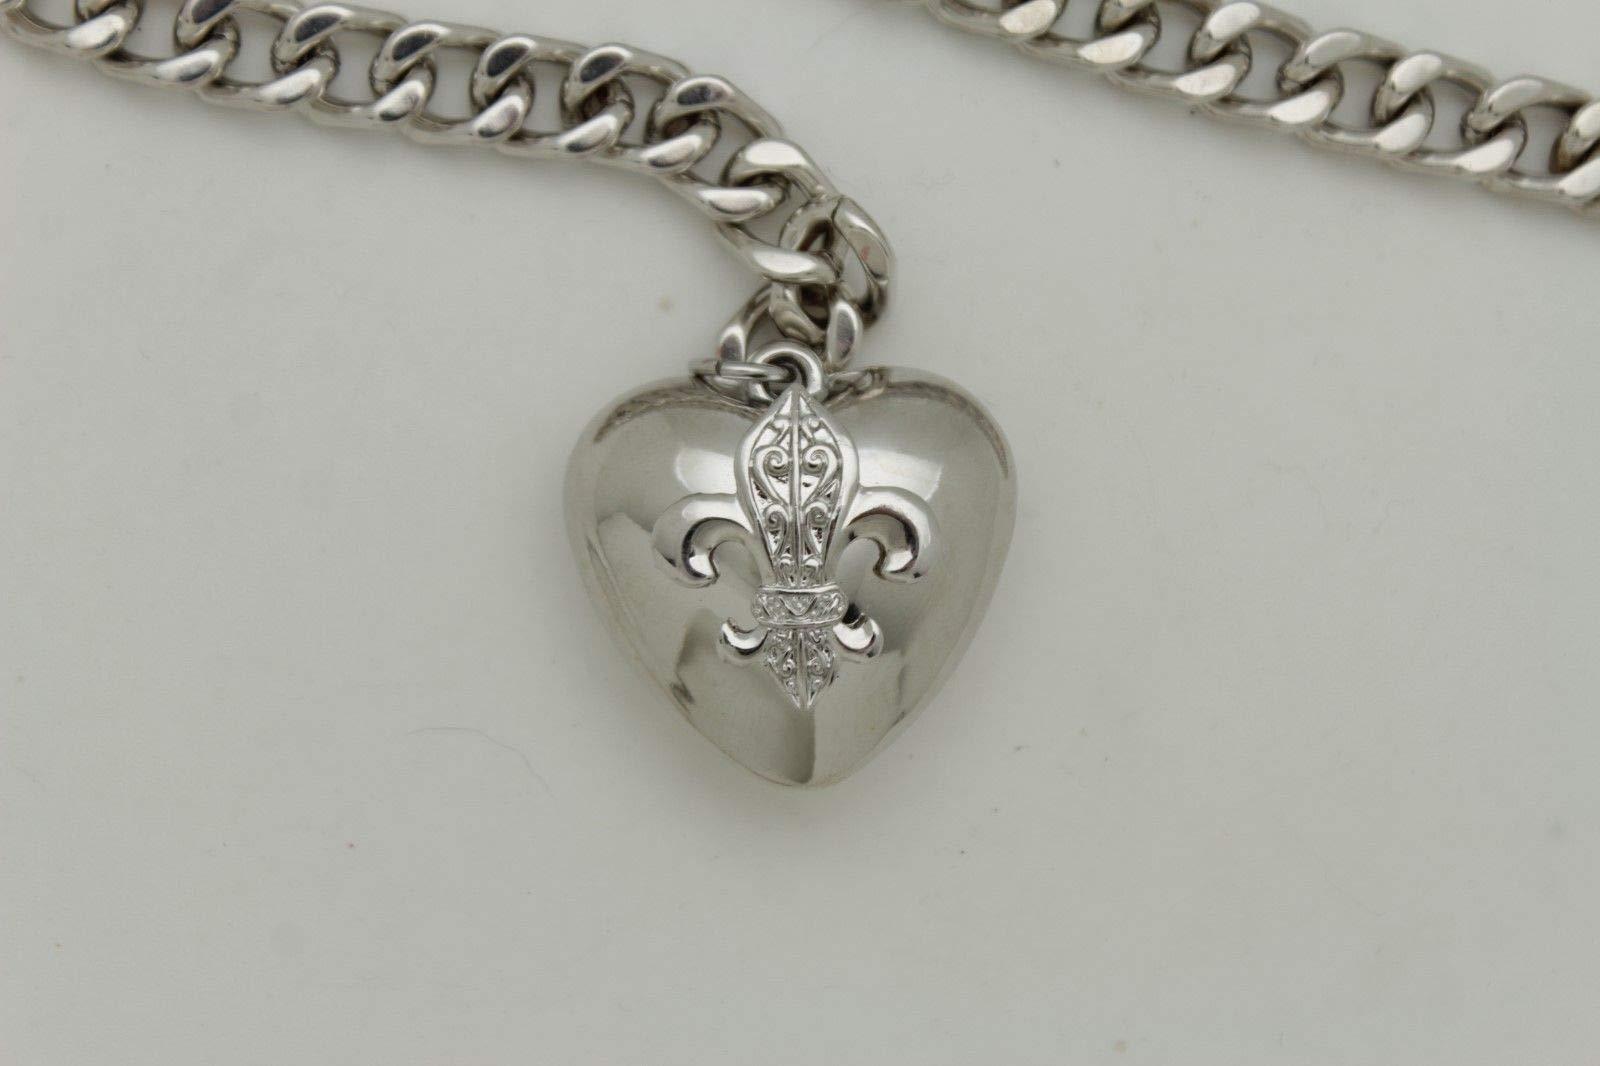 Women Hip Waist Silver Metal Chain Fashion Belt Love Heart Buckle Charm XS S M by RIX Fashion Luxury (Image #9)